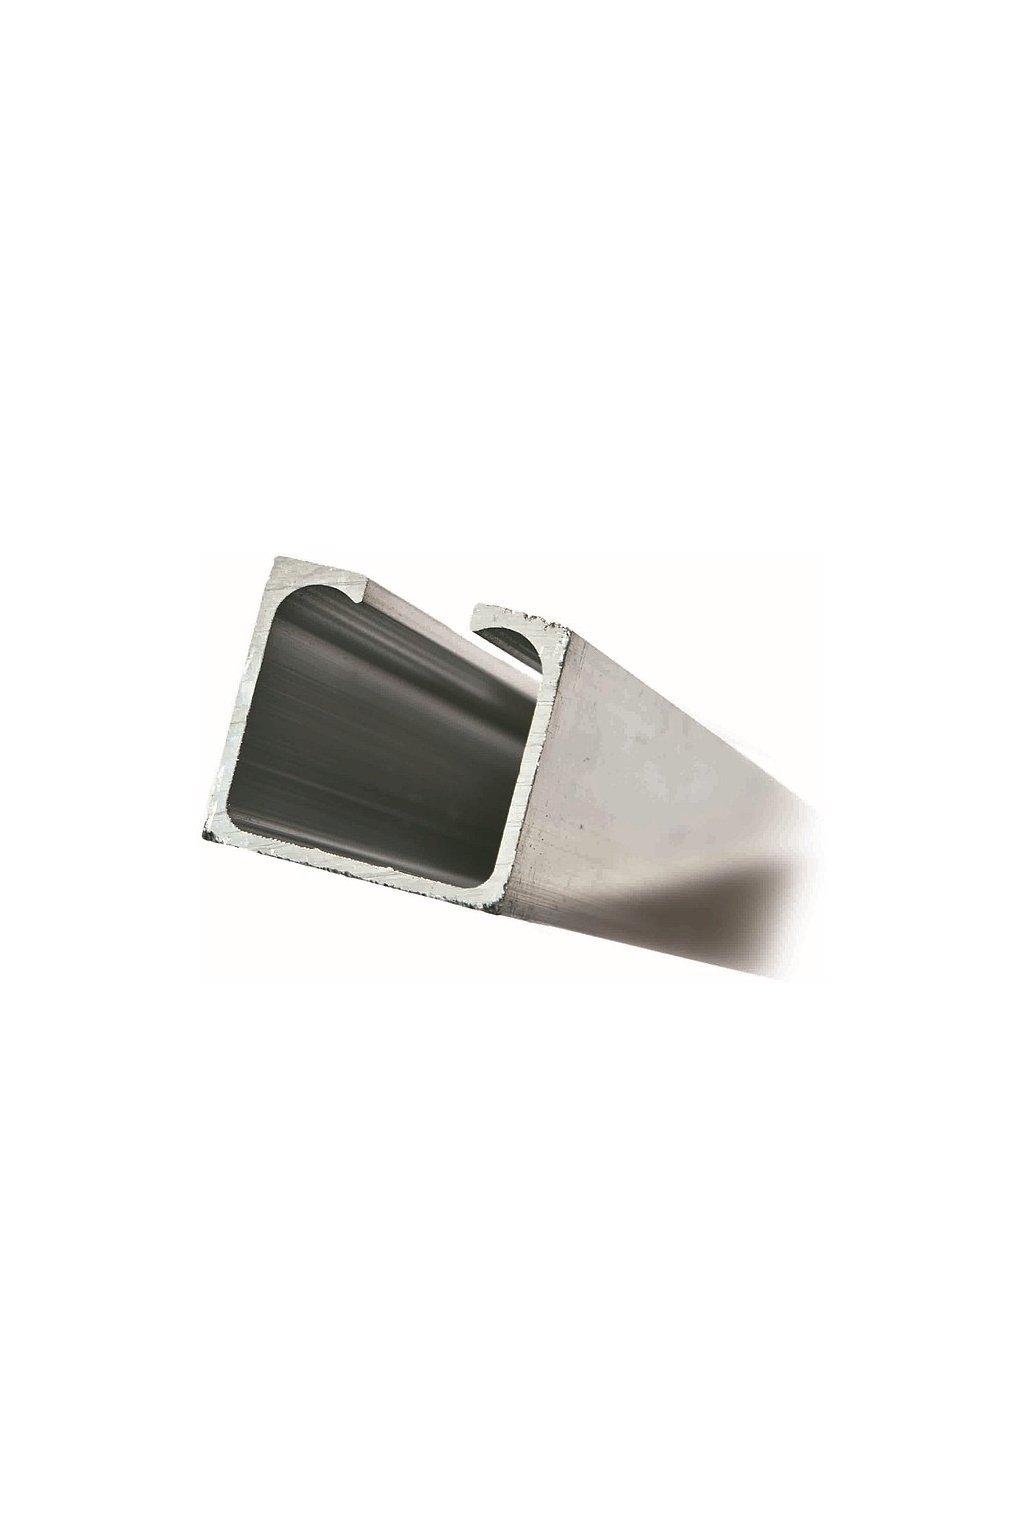 Kolejnice Onyx 4540 - 200 cm